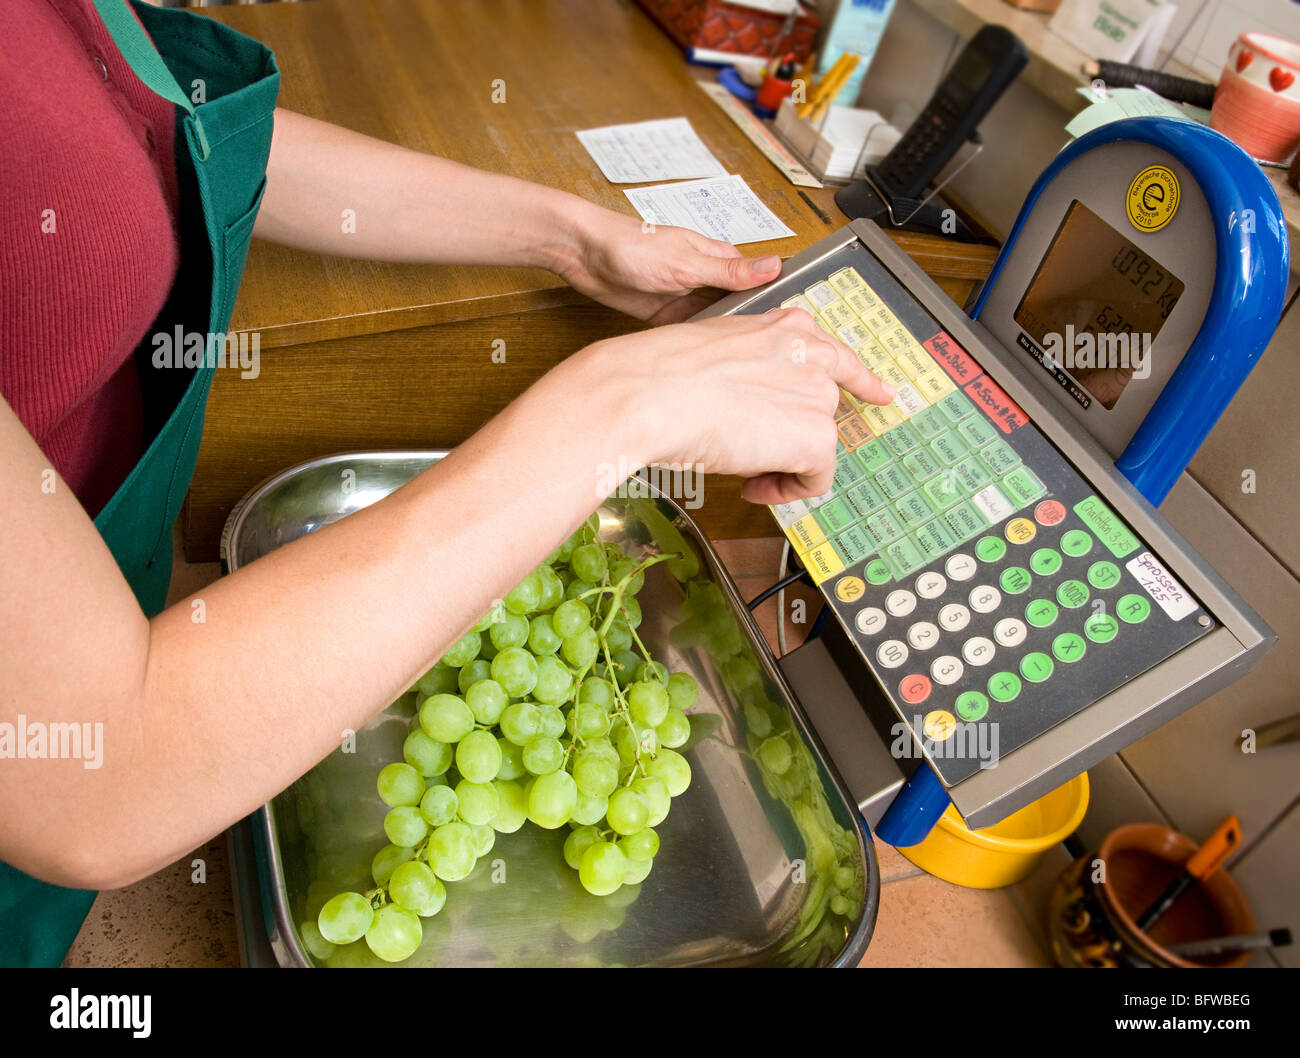 shopkeeper putting fruit on scale - Stock Image